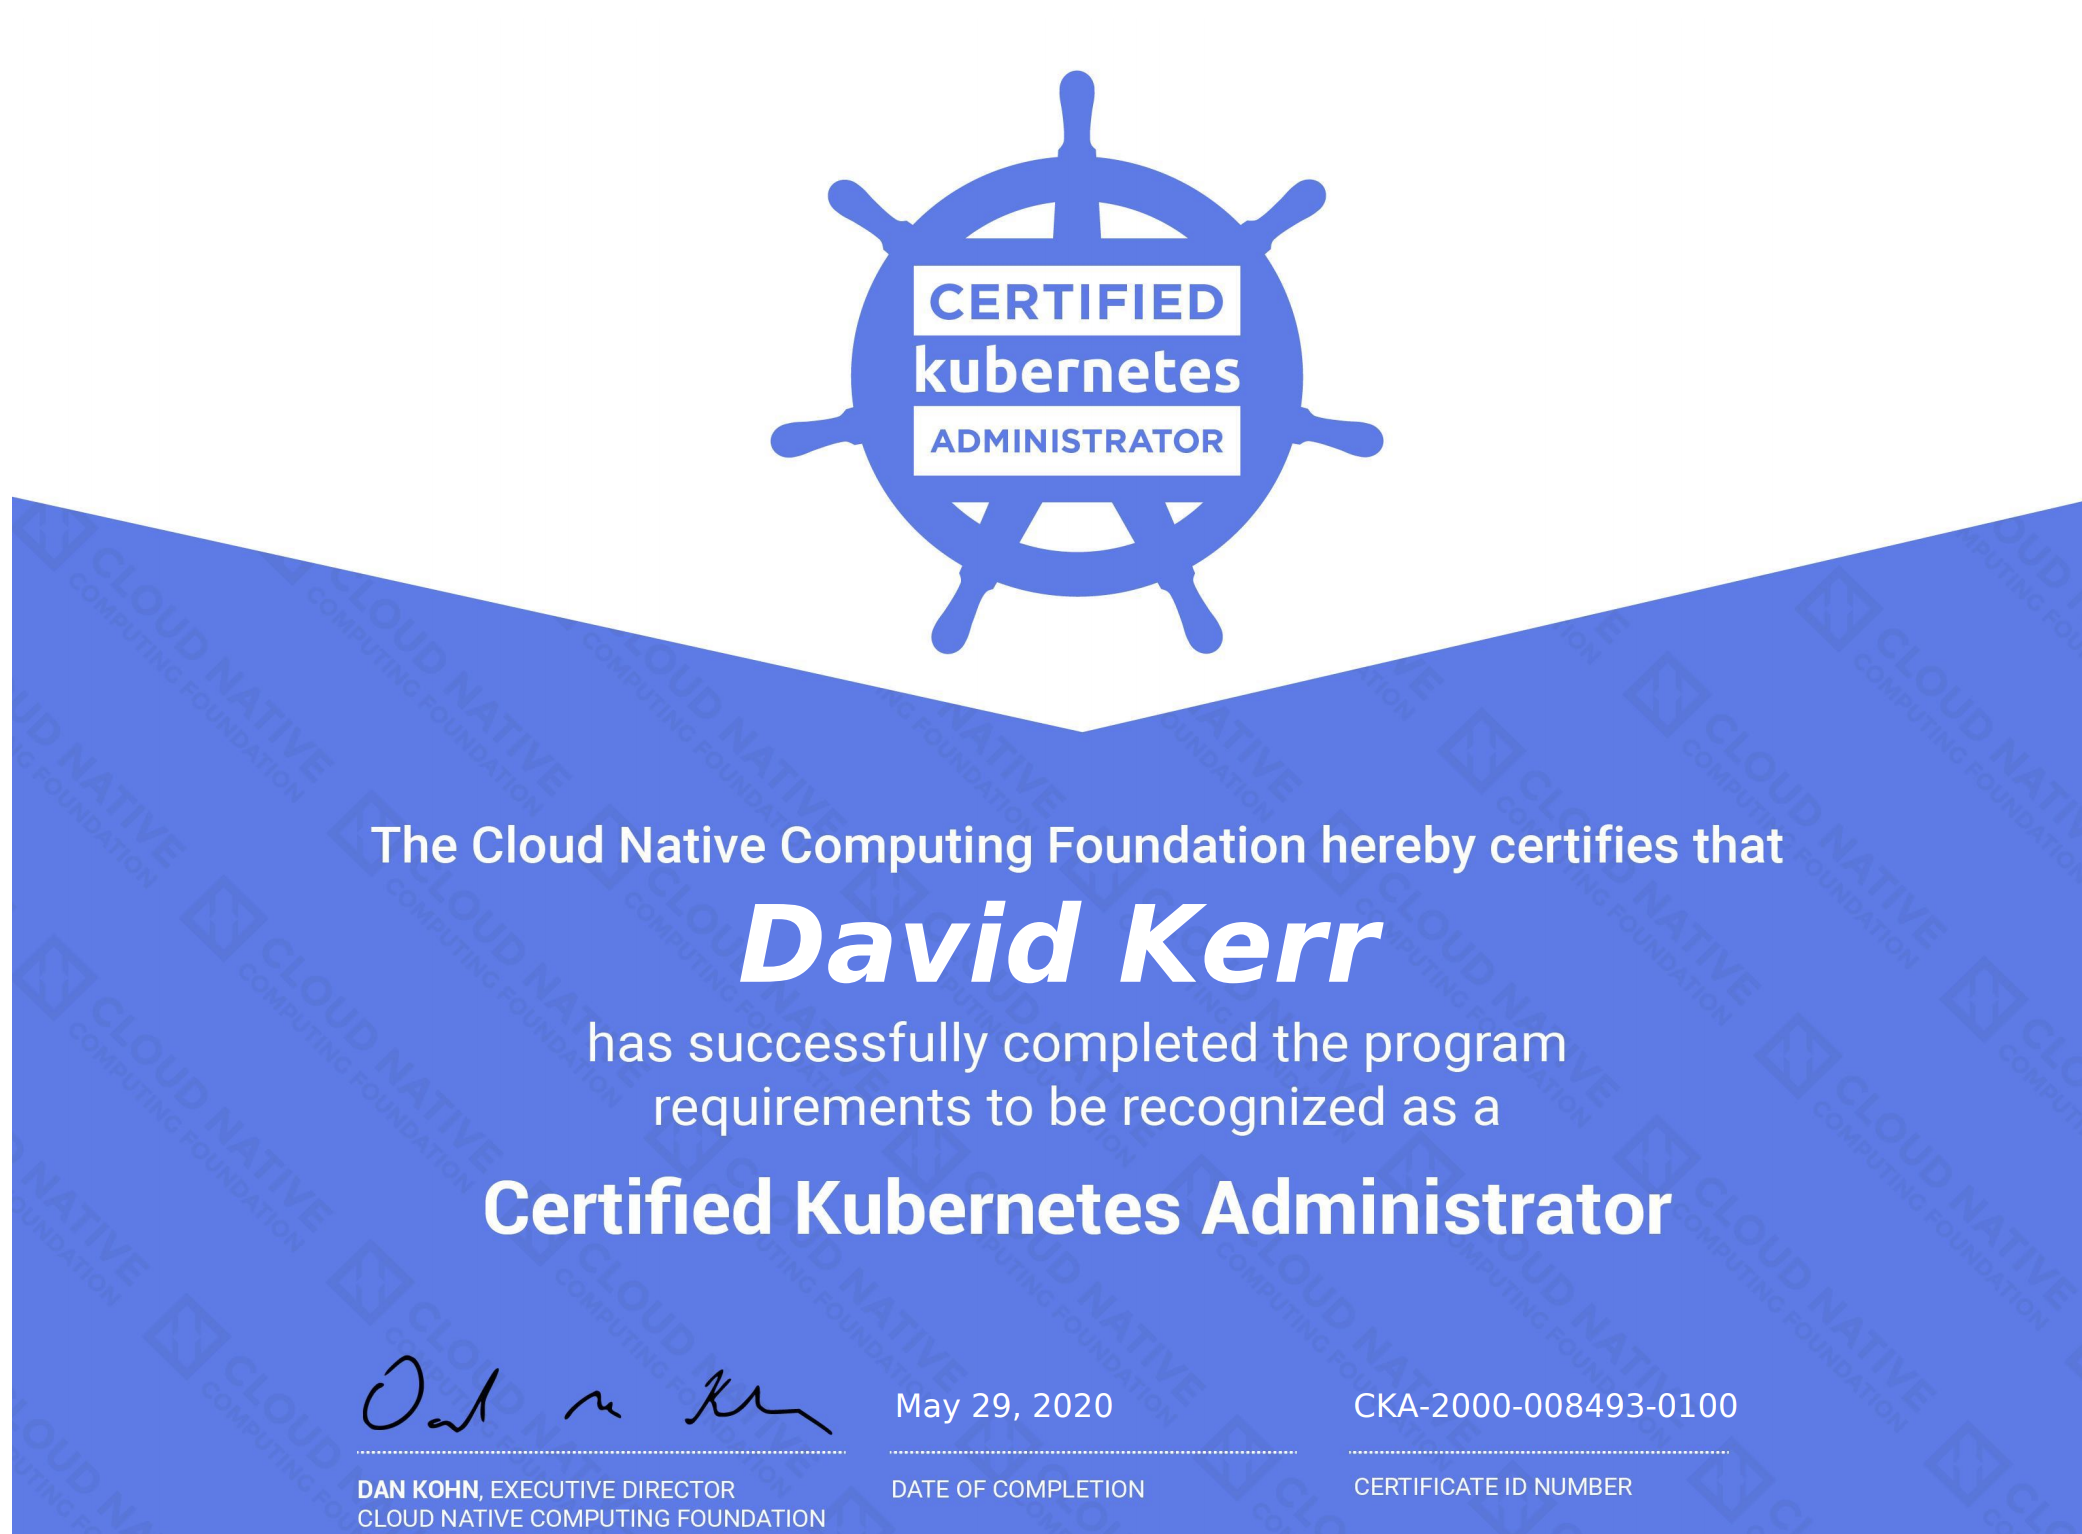 cka tips certification observations tricks please